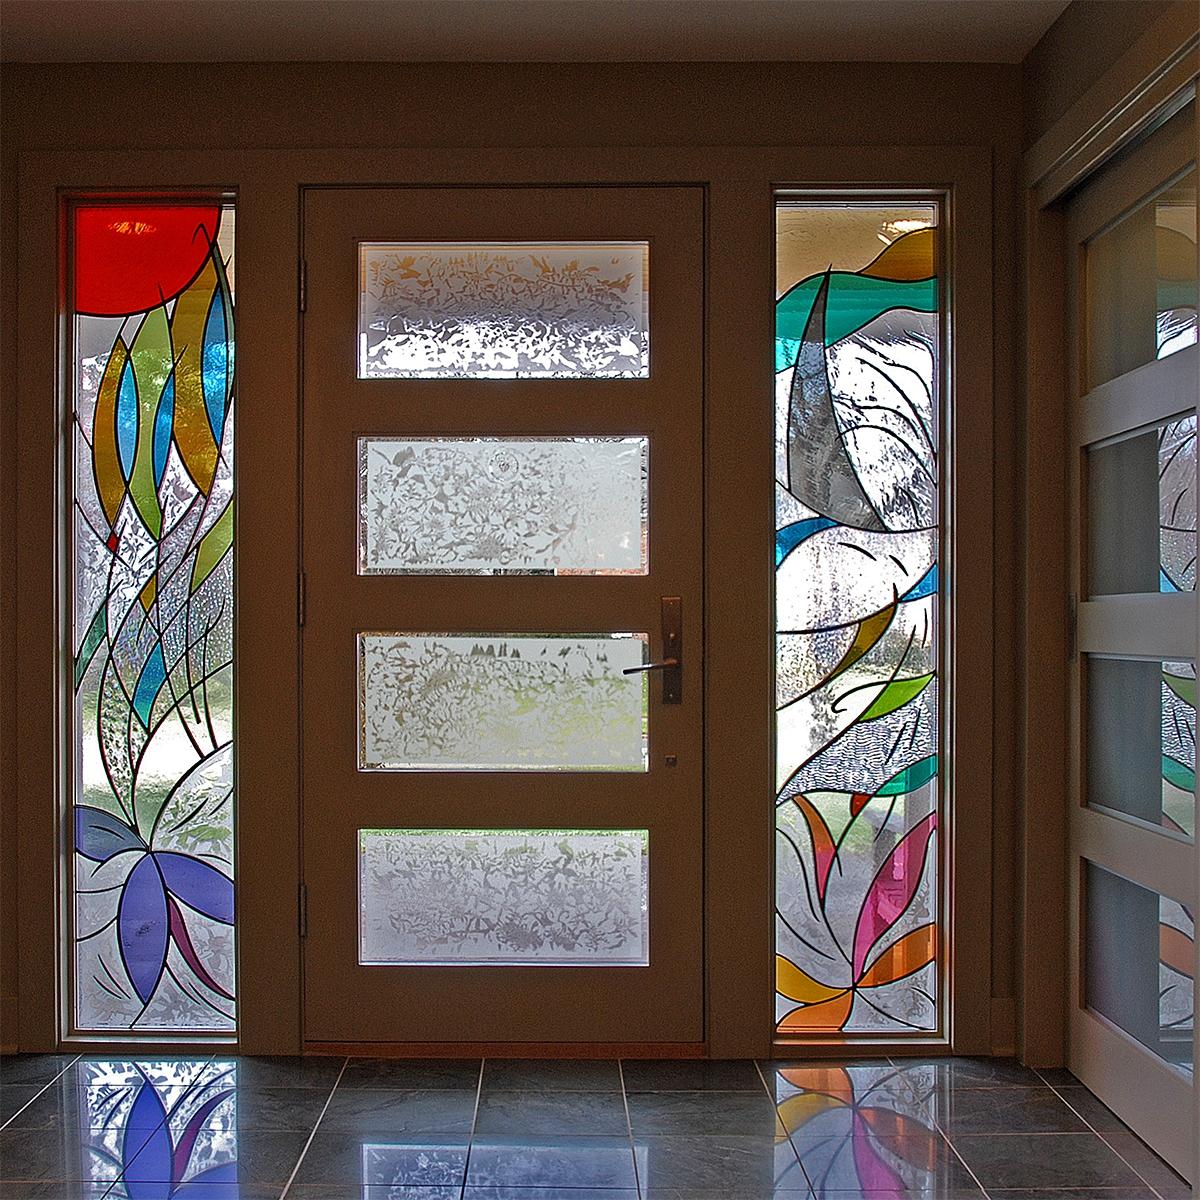 Fresh Air Nancy Gong Glass Works